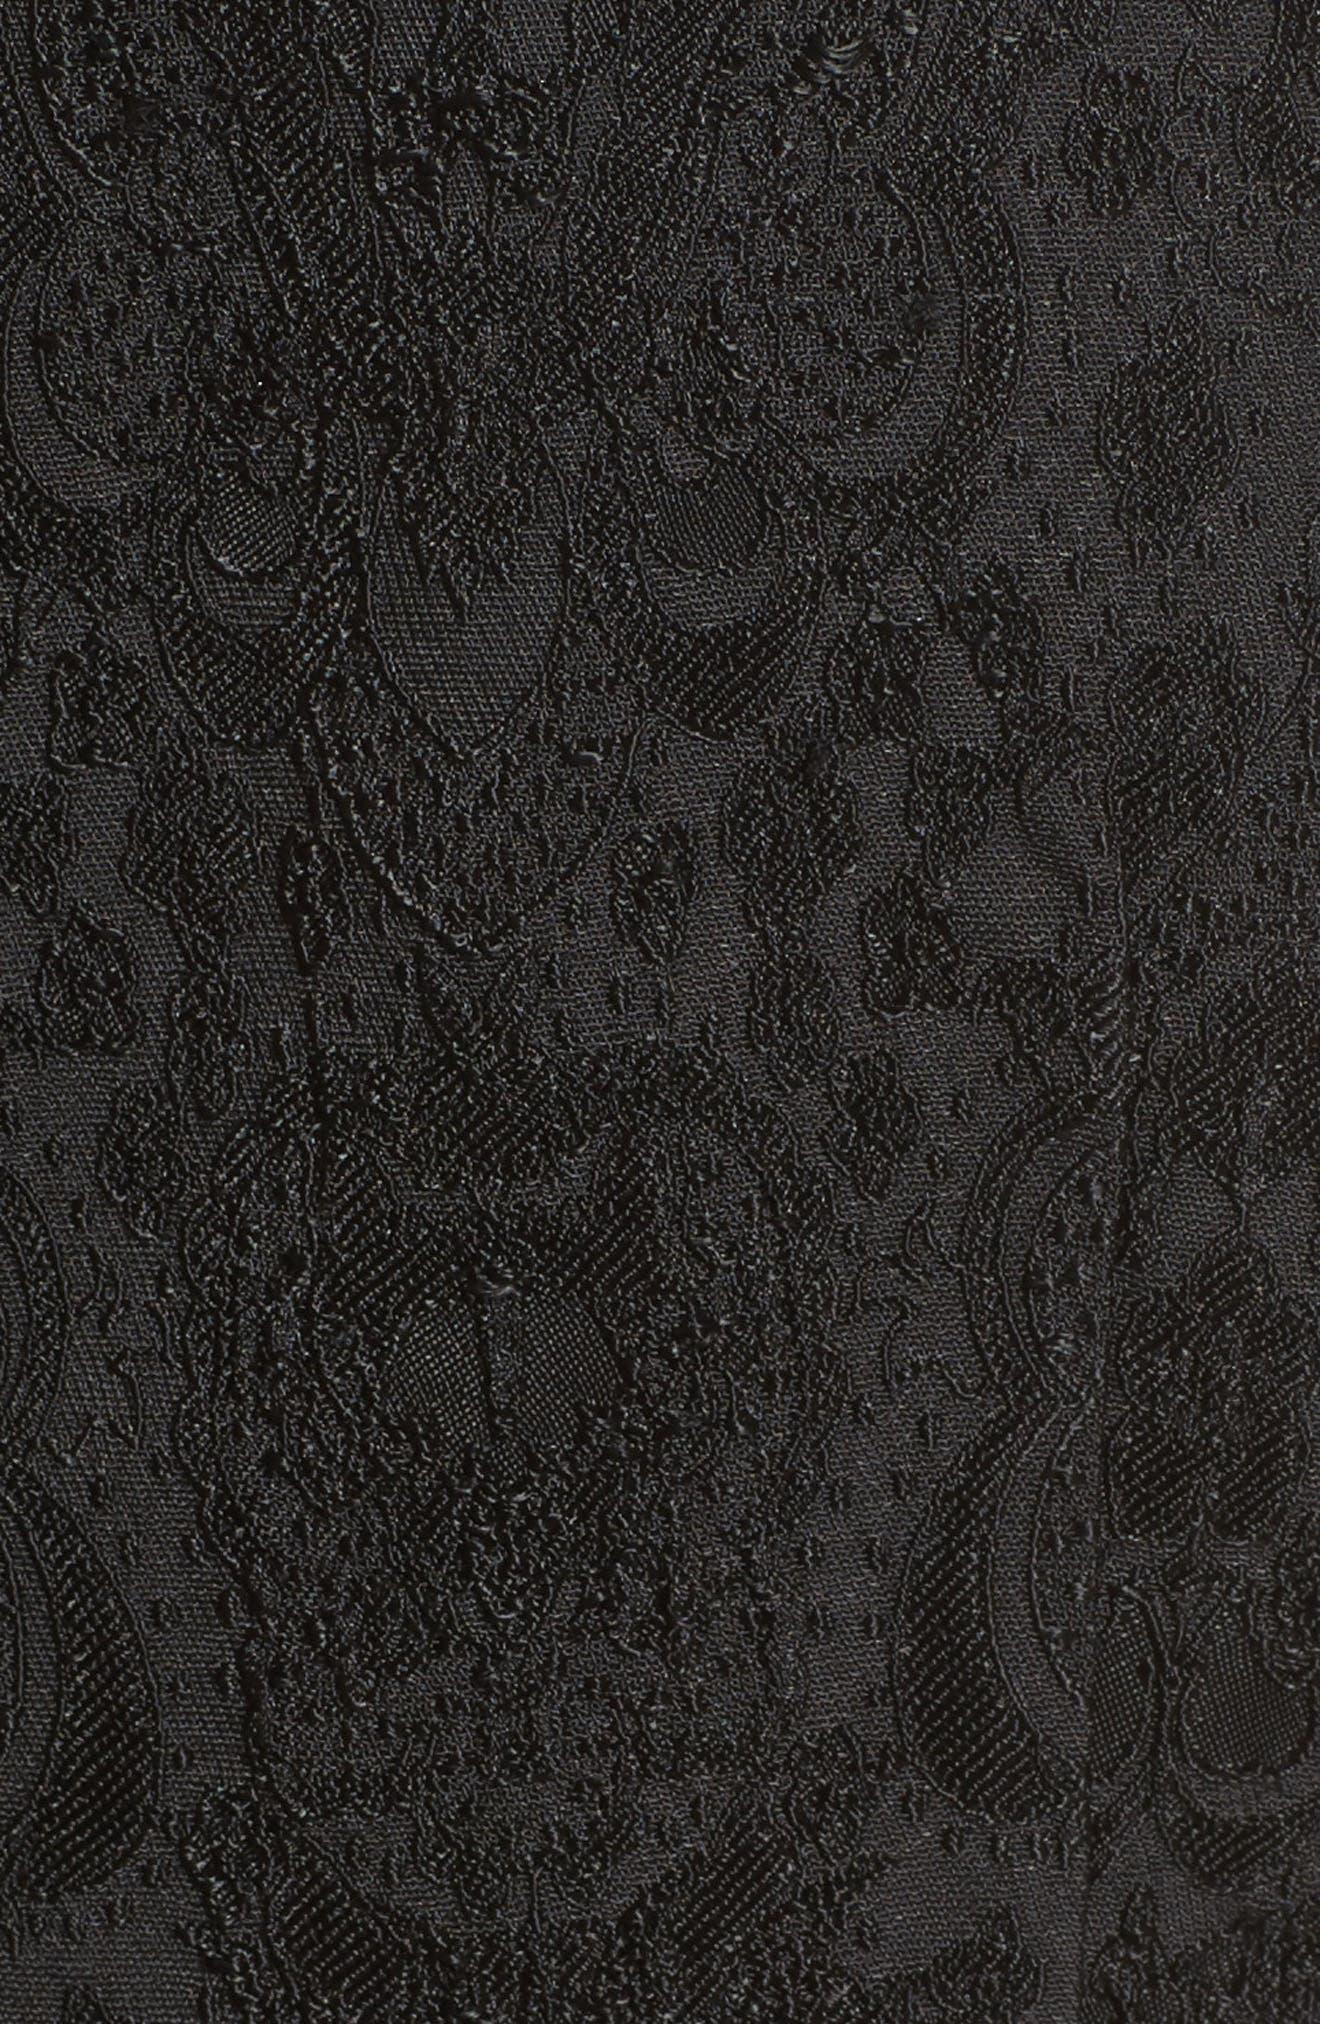 Embellished Jacquard Peplum Top,                             Alternate thumbnail 5, color,                             001